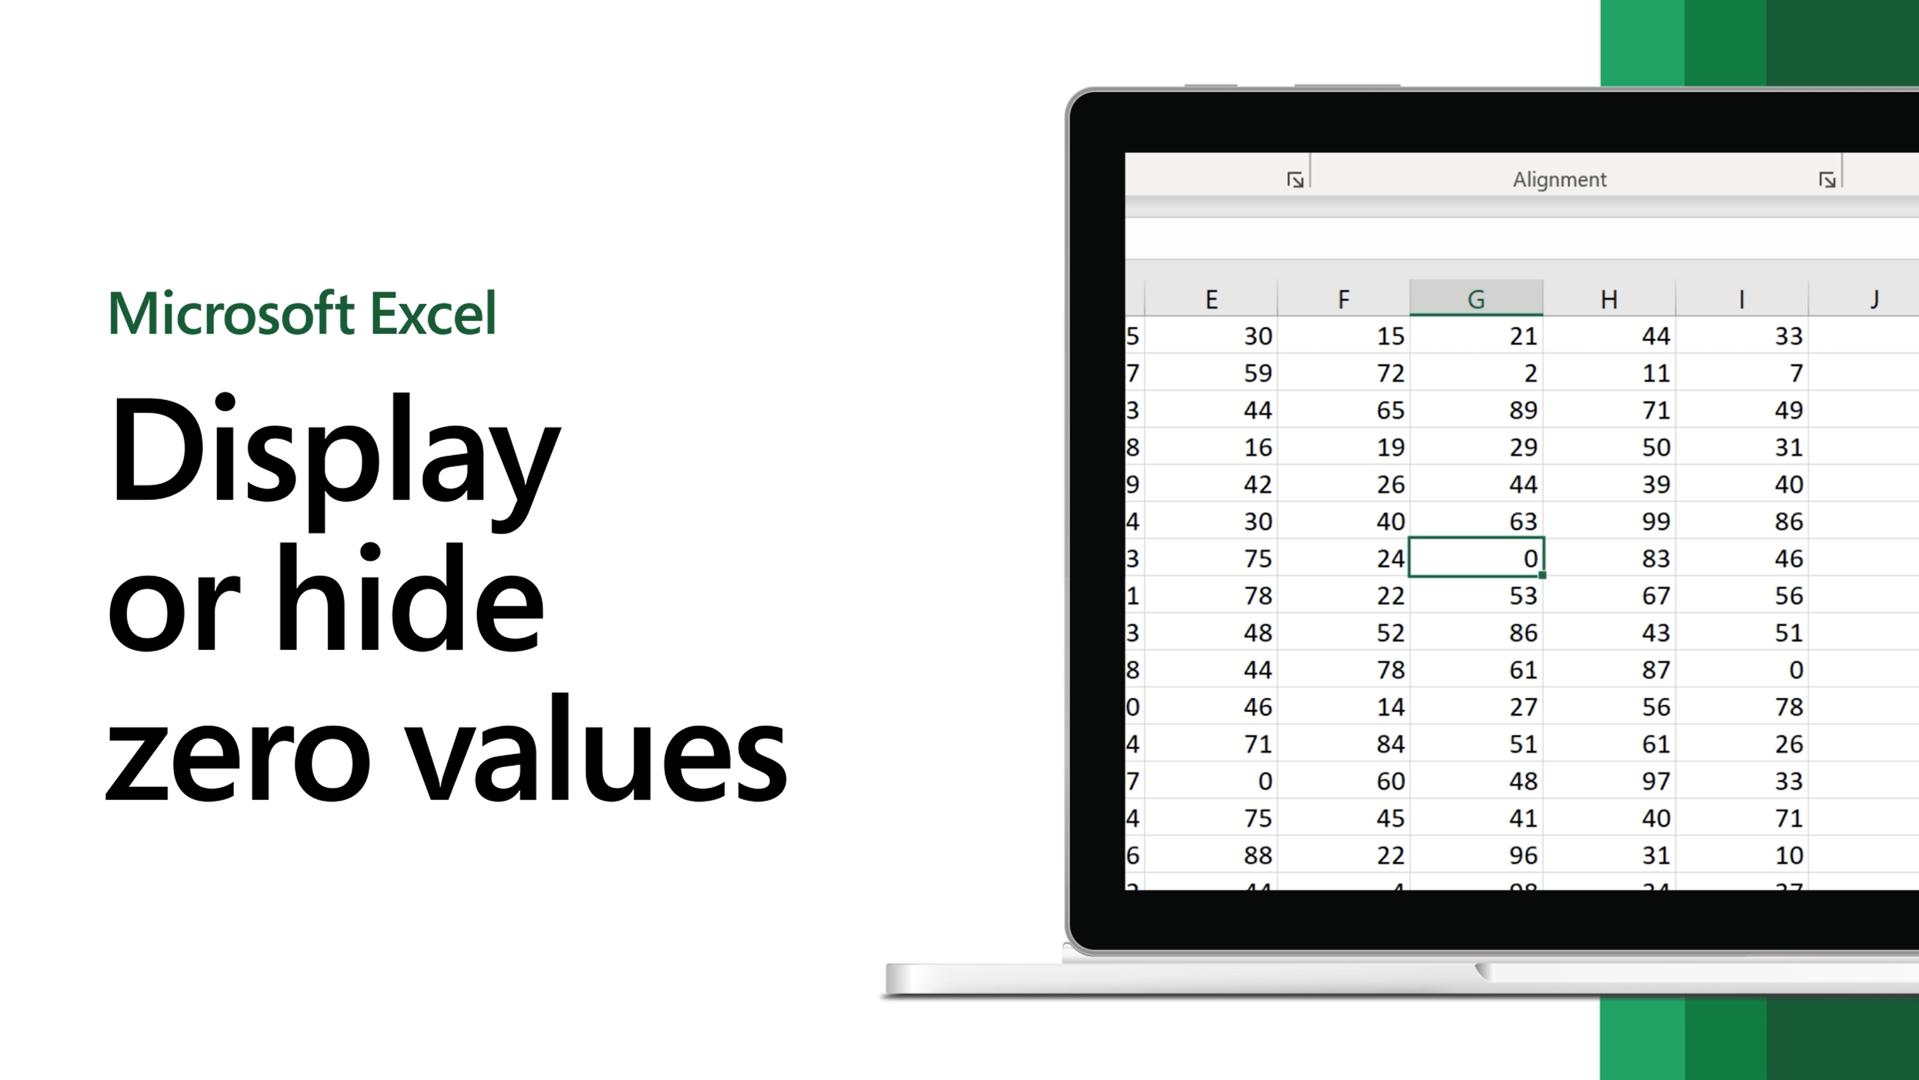 Display or hid zero values